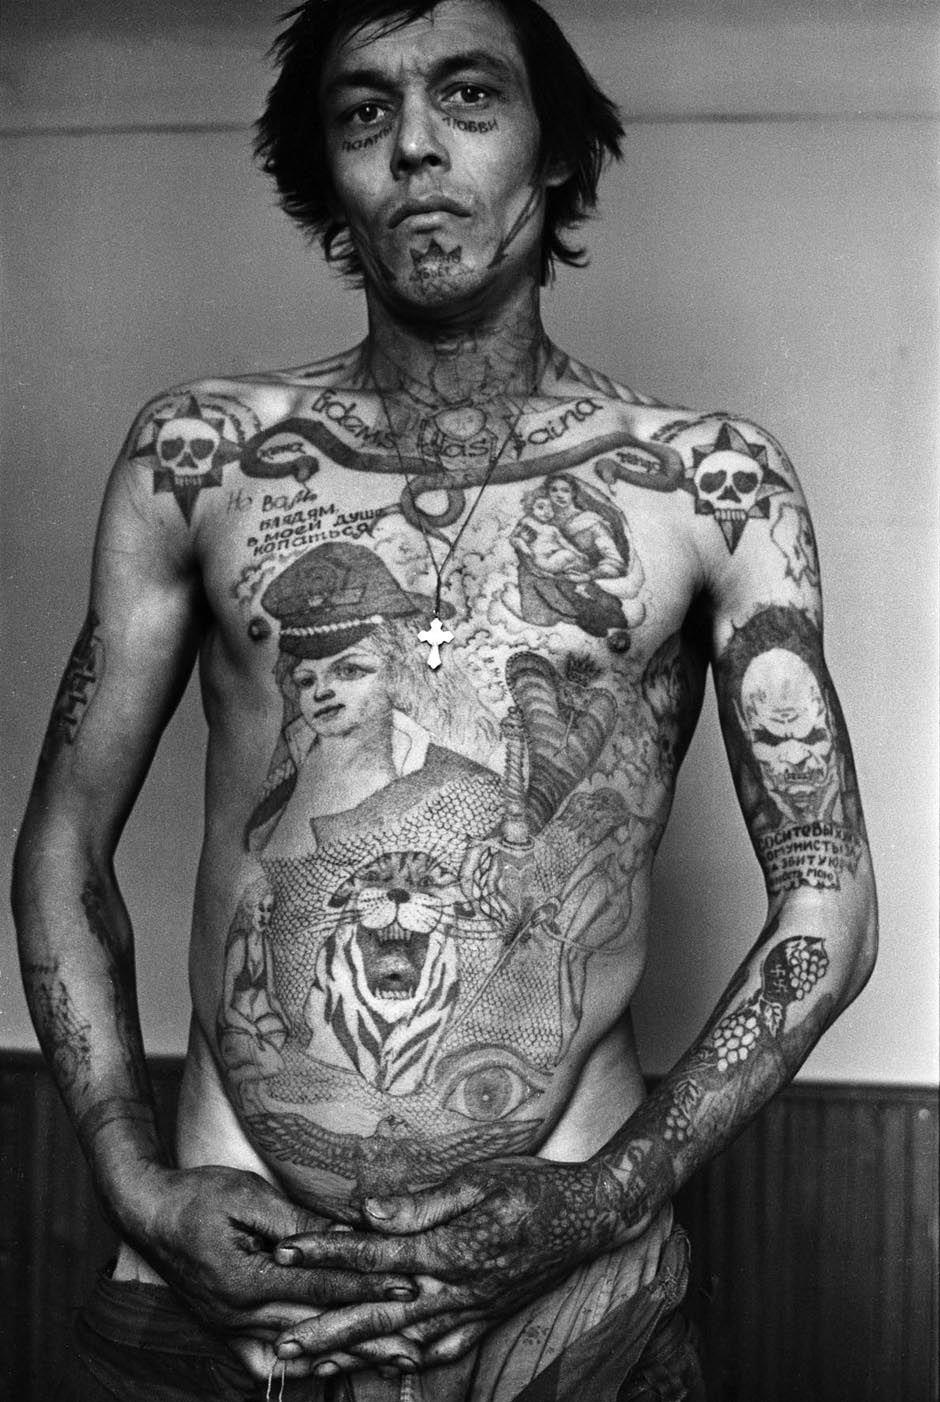 http://www.laboiteverte.fr/wp-content/uploads/2011/02/tatouage-encyclopedie-criminel-russe-prison-01.jpg